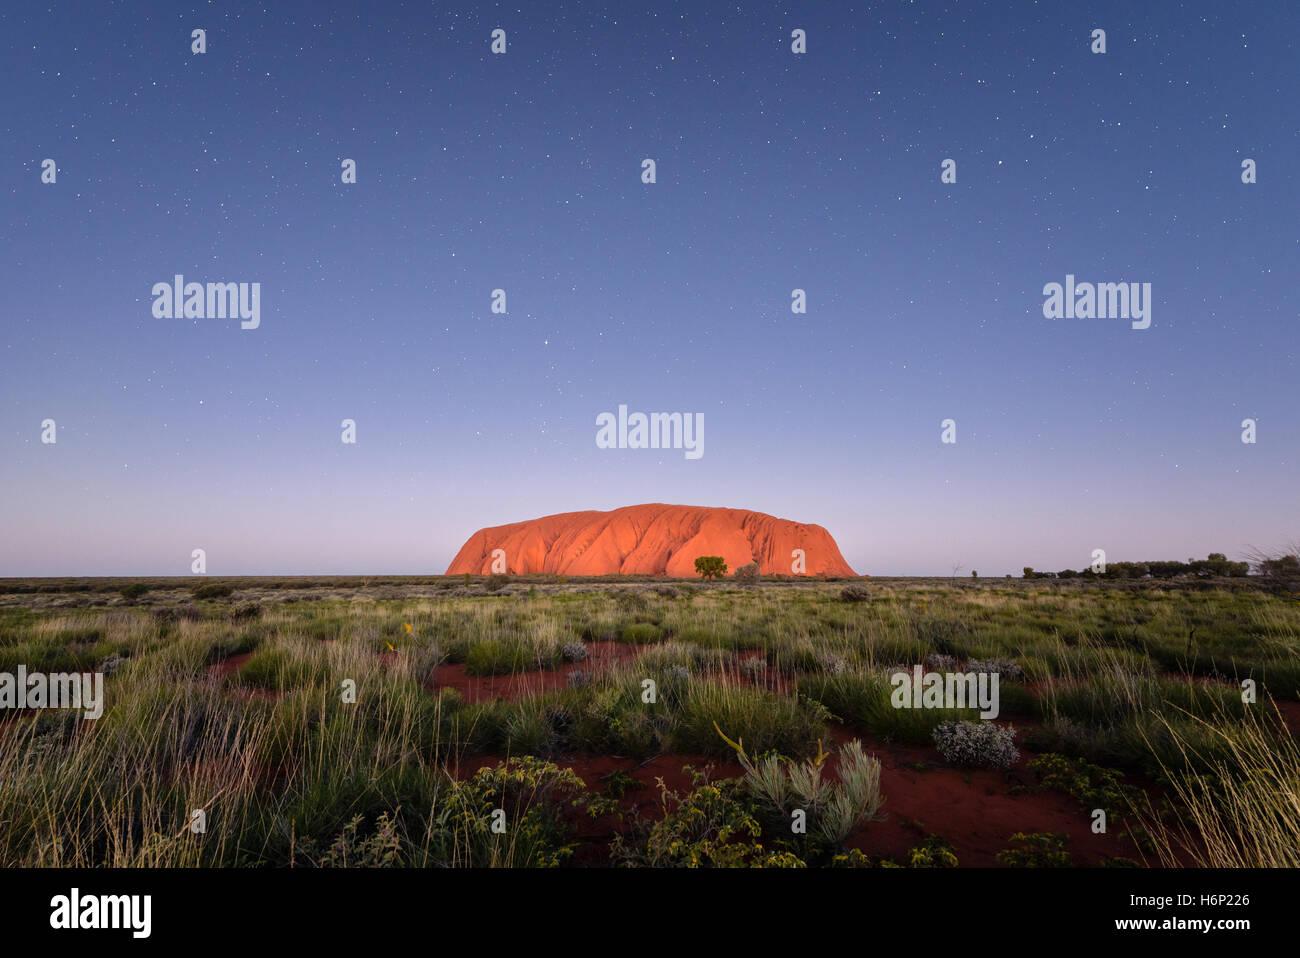 Uluru under night sky with stars - Stock Image